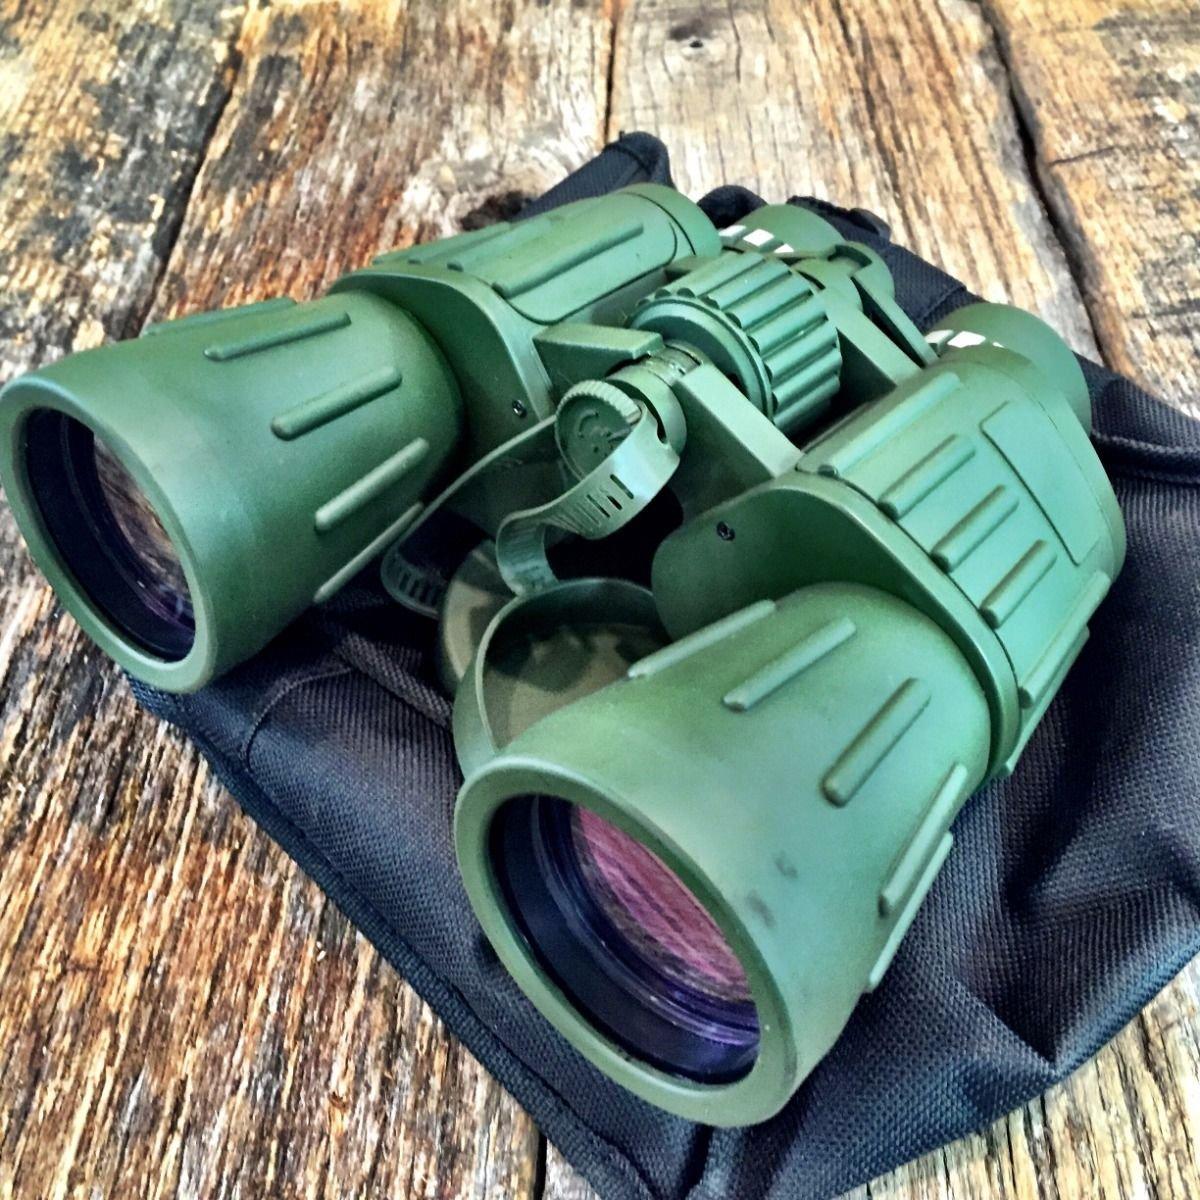 Sawan Shop Day/Night 60X50 Military Army Binoculars Camouflage w/Pouch by Sawan Shop